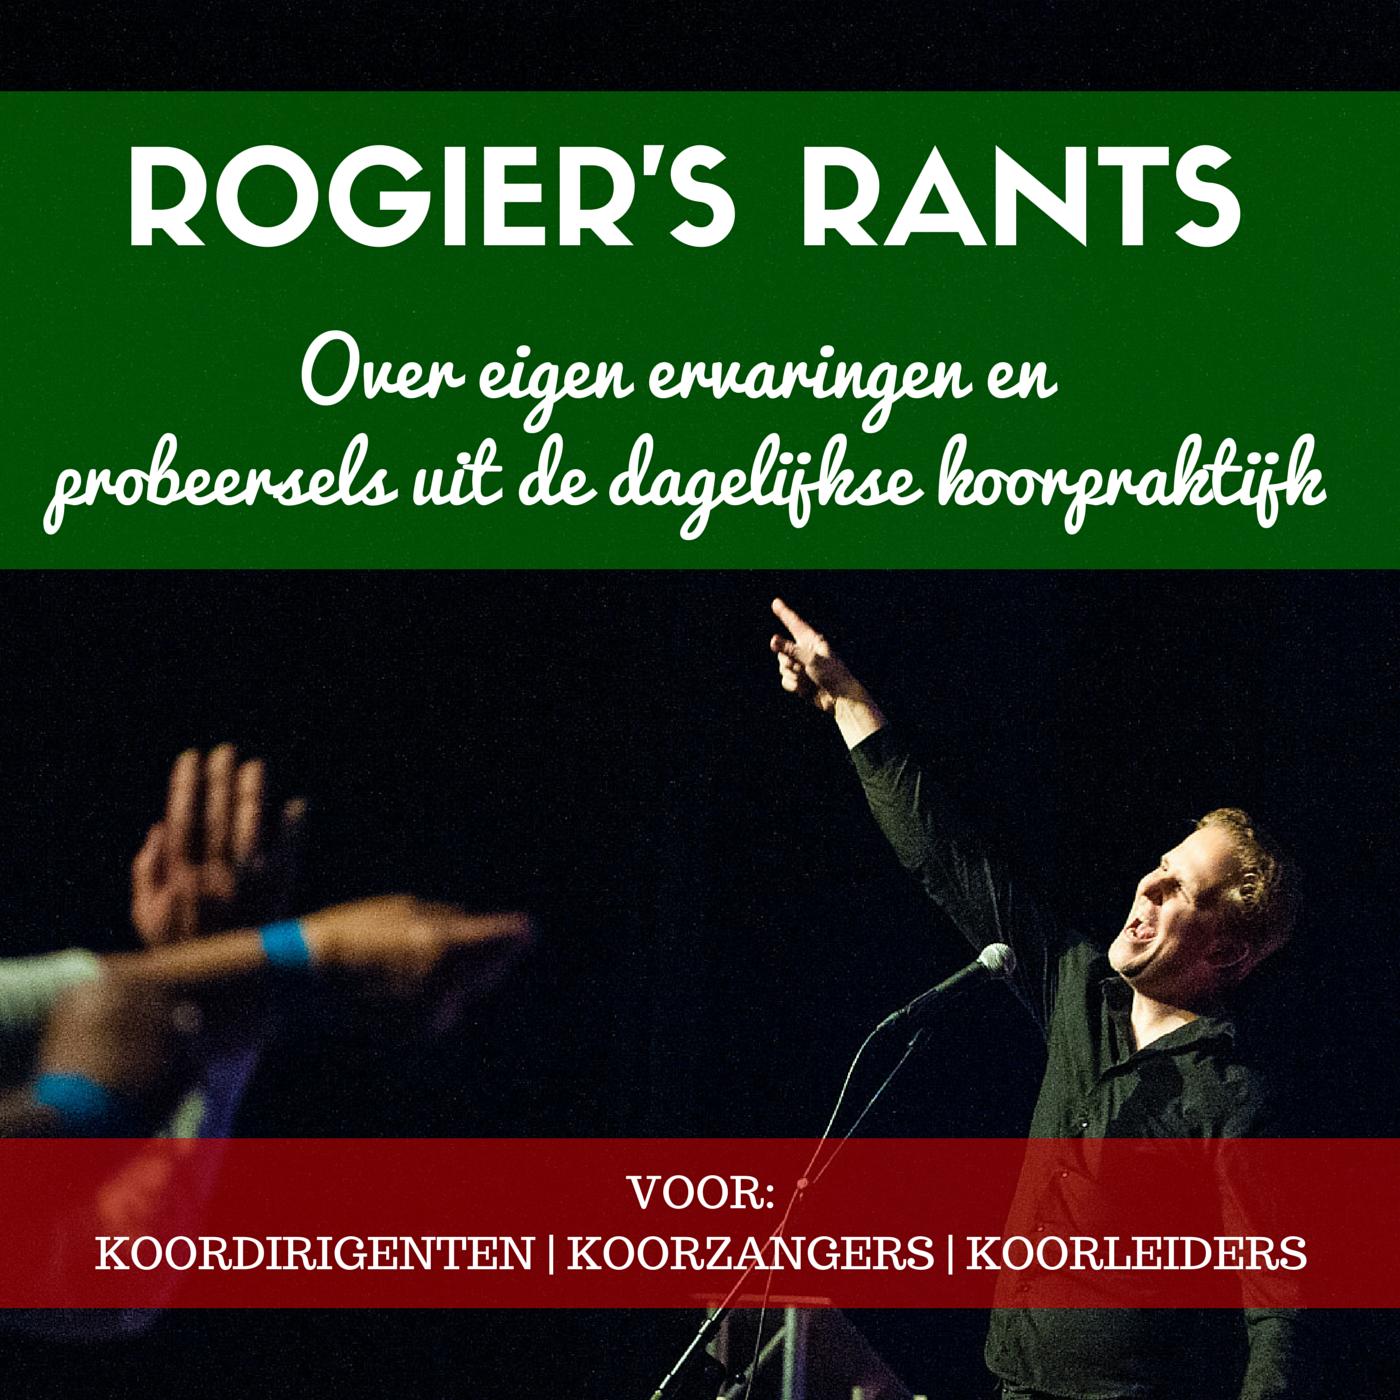 Rogier's Rants